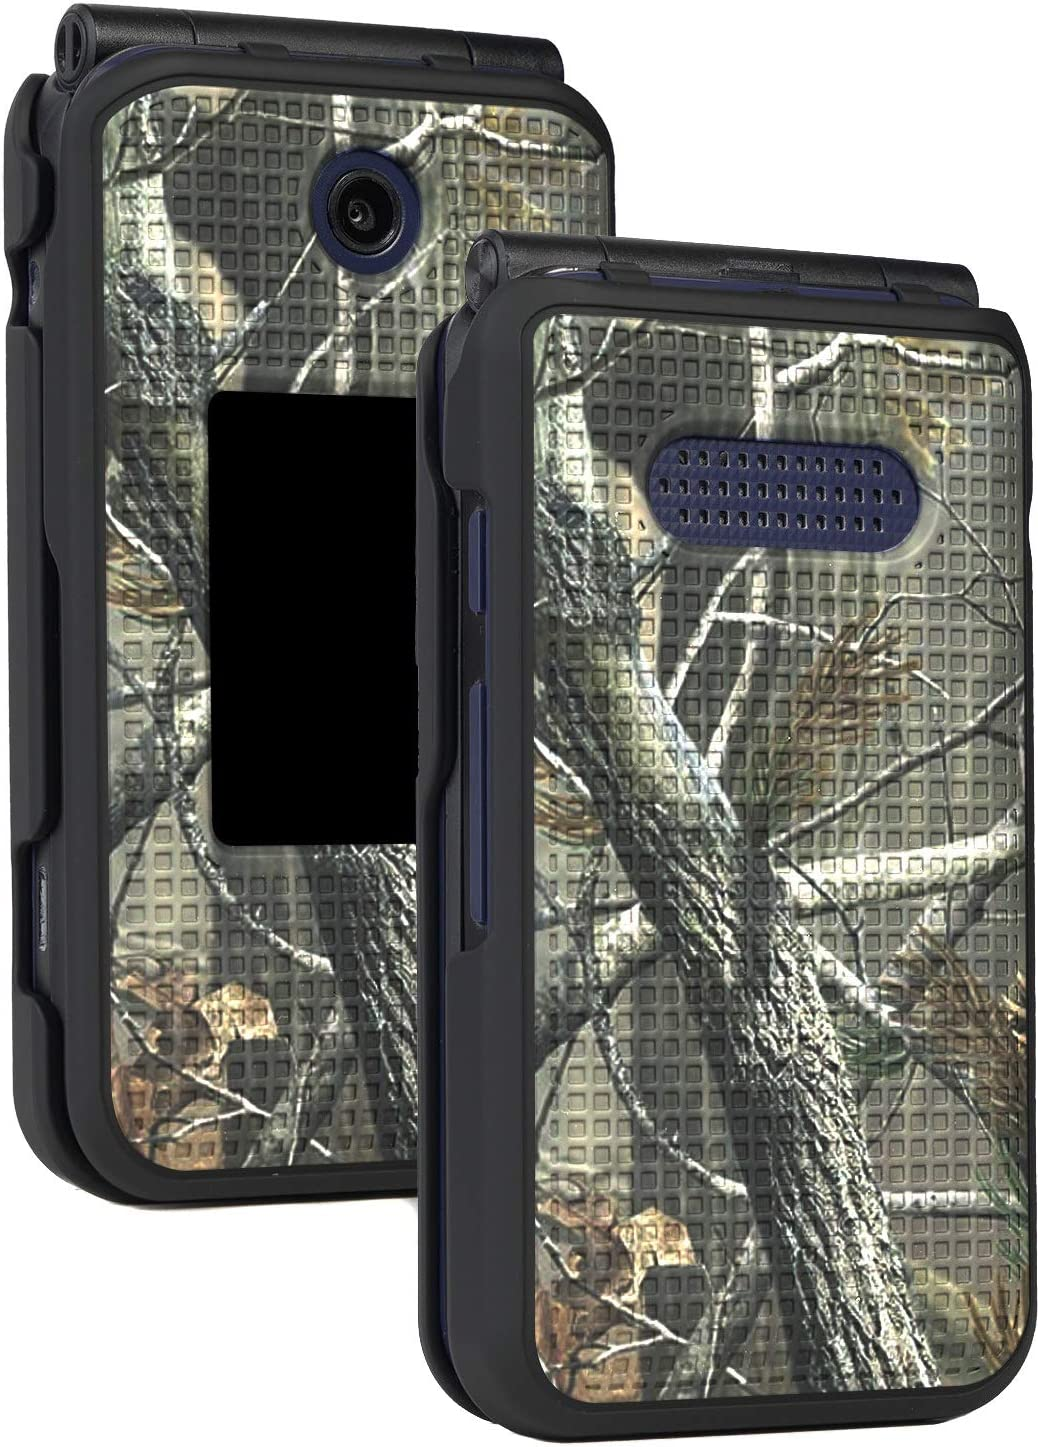 Case for Cingular Flip 4, Cricket Debut Case, Nakedcellphone [Outdoor Camouflage] Tree Leaf Real Woods Camo Protective Cover for Cricket Debut Flip (U102AC), AT&T Cingular Flip IV Phone (U102AA)